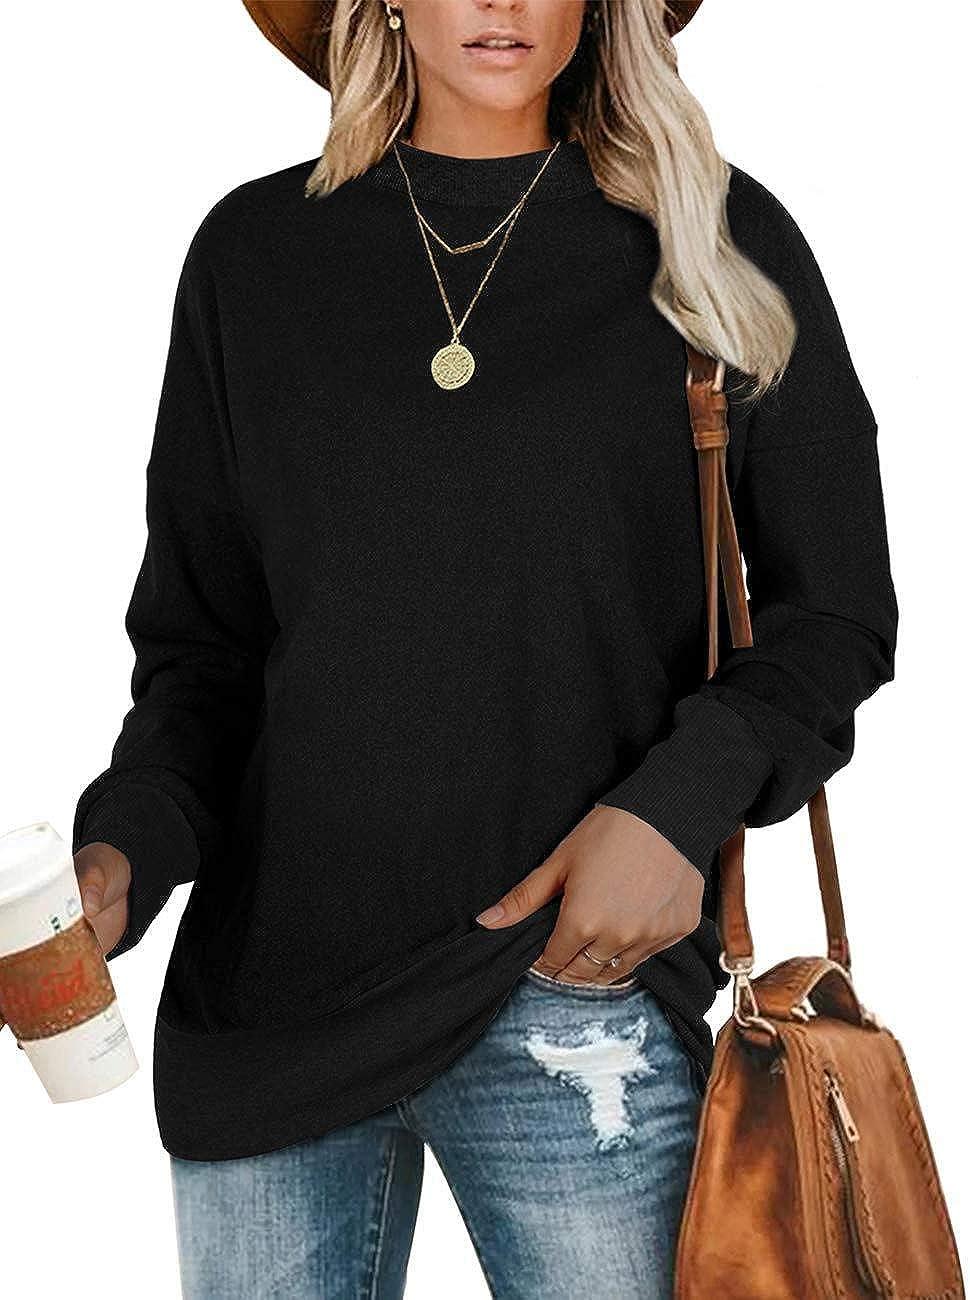 HARGLESMAN Womens Sweatshirts Fashion Casual Long Sleeve Crewneck Solid Pullover Tunic Tops Shirts